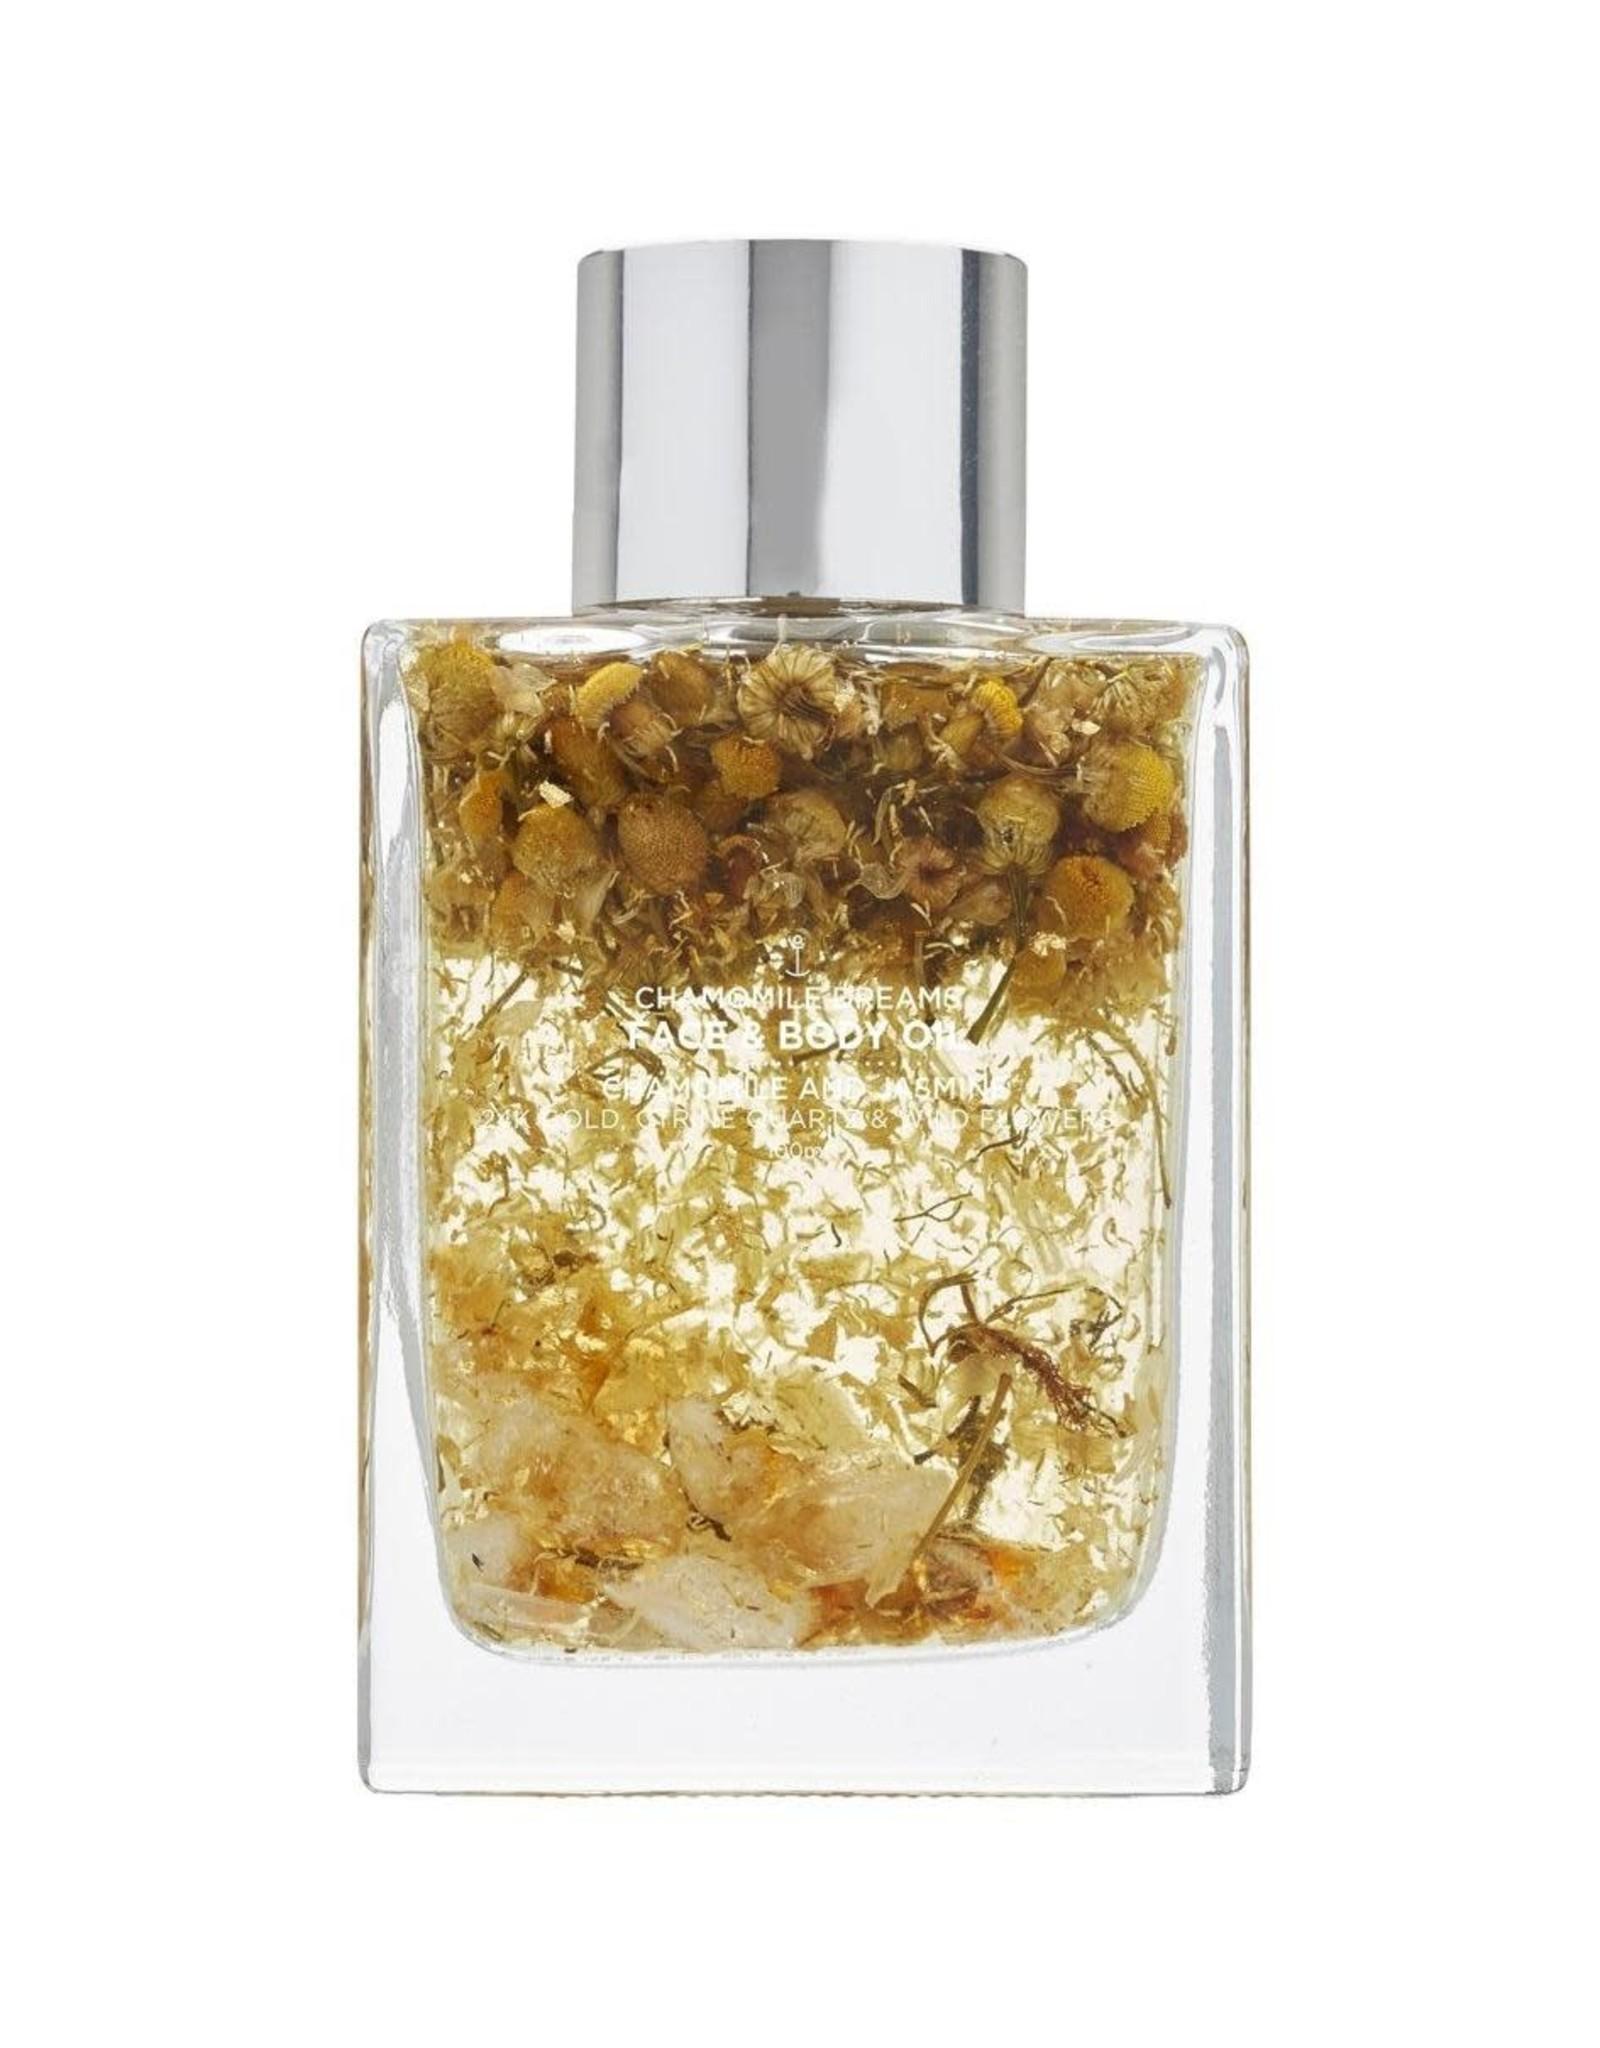 Summer Salt Body Face & Body Oil with 24k Gold 100ml